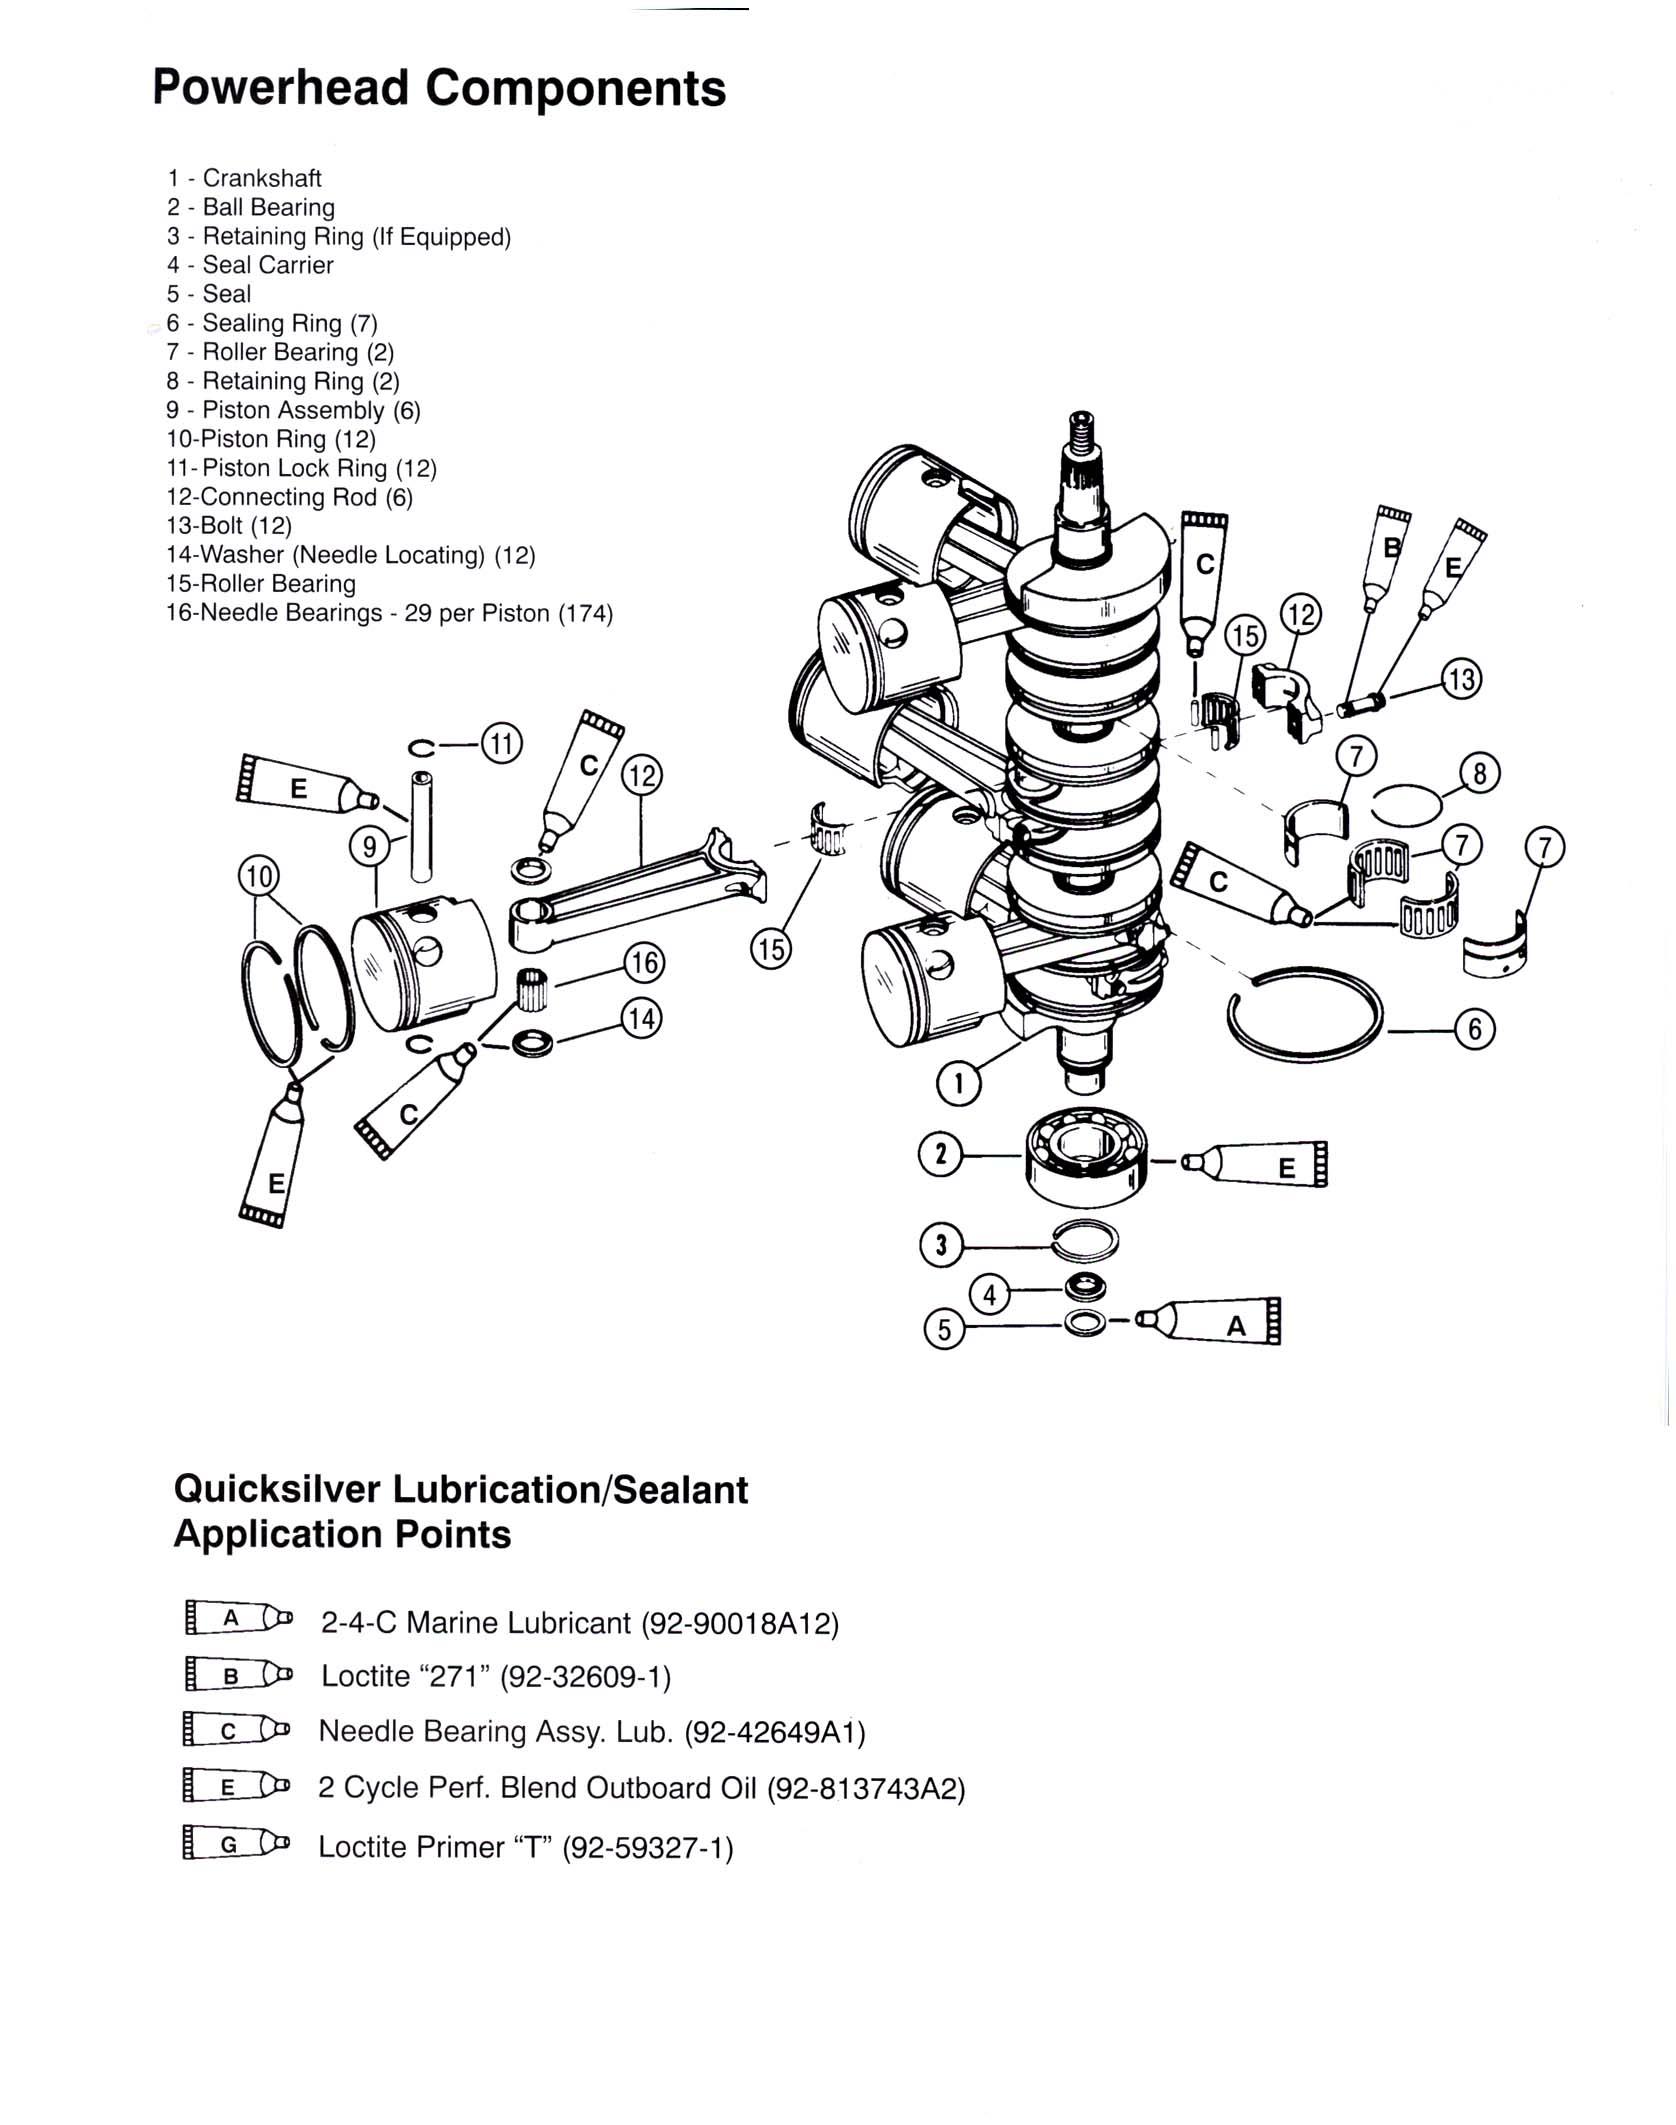 hight resolution of powerhead torque specs 2 4 fish pg1 2 4 fish pg2 8 2 5 fish pg1 2 5 hi po pg1 2 5 hi po pg2 2 5 hi po pg3 2 5 assembly lubes